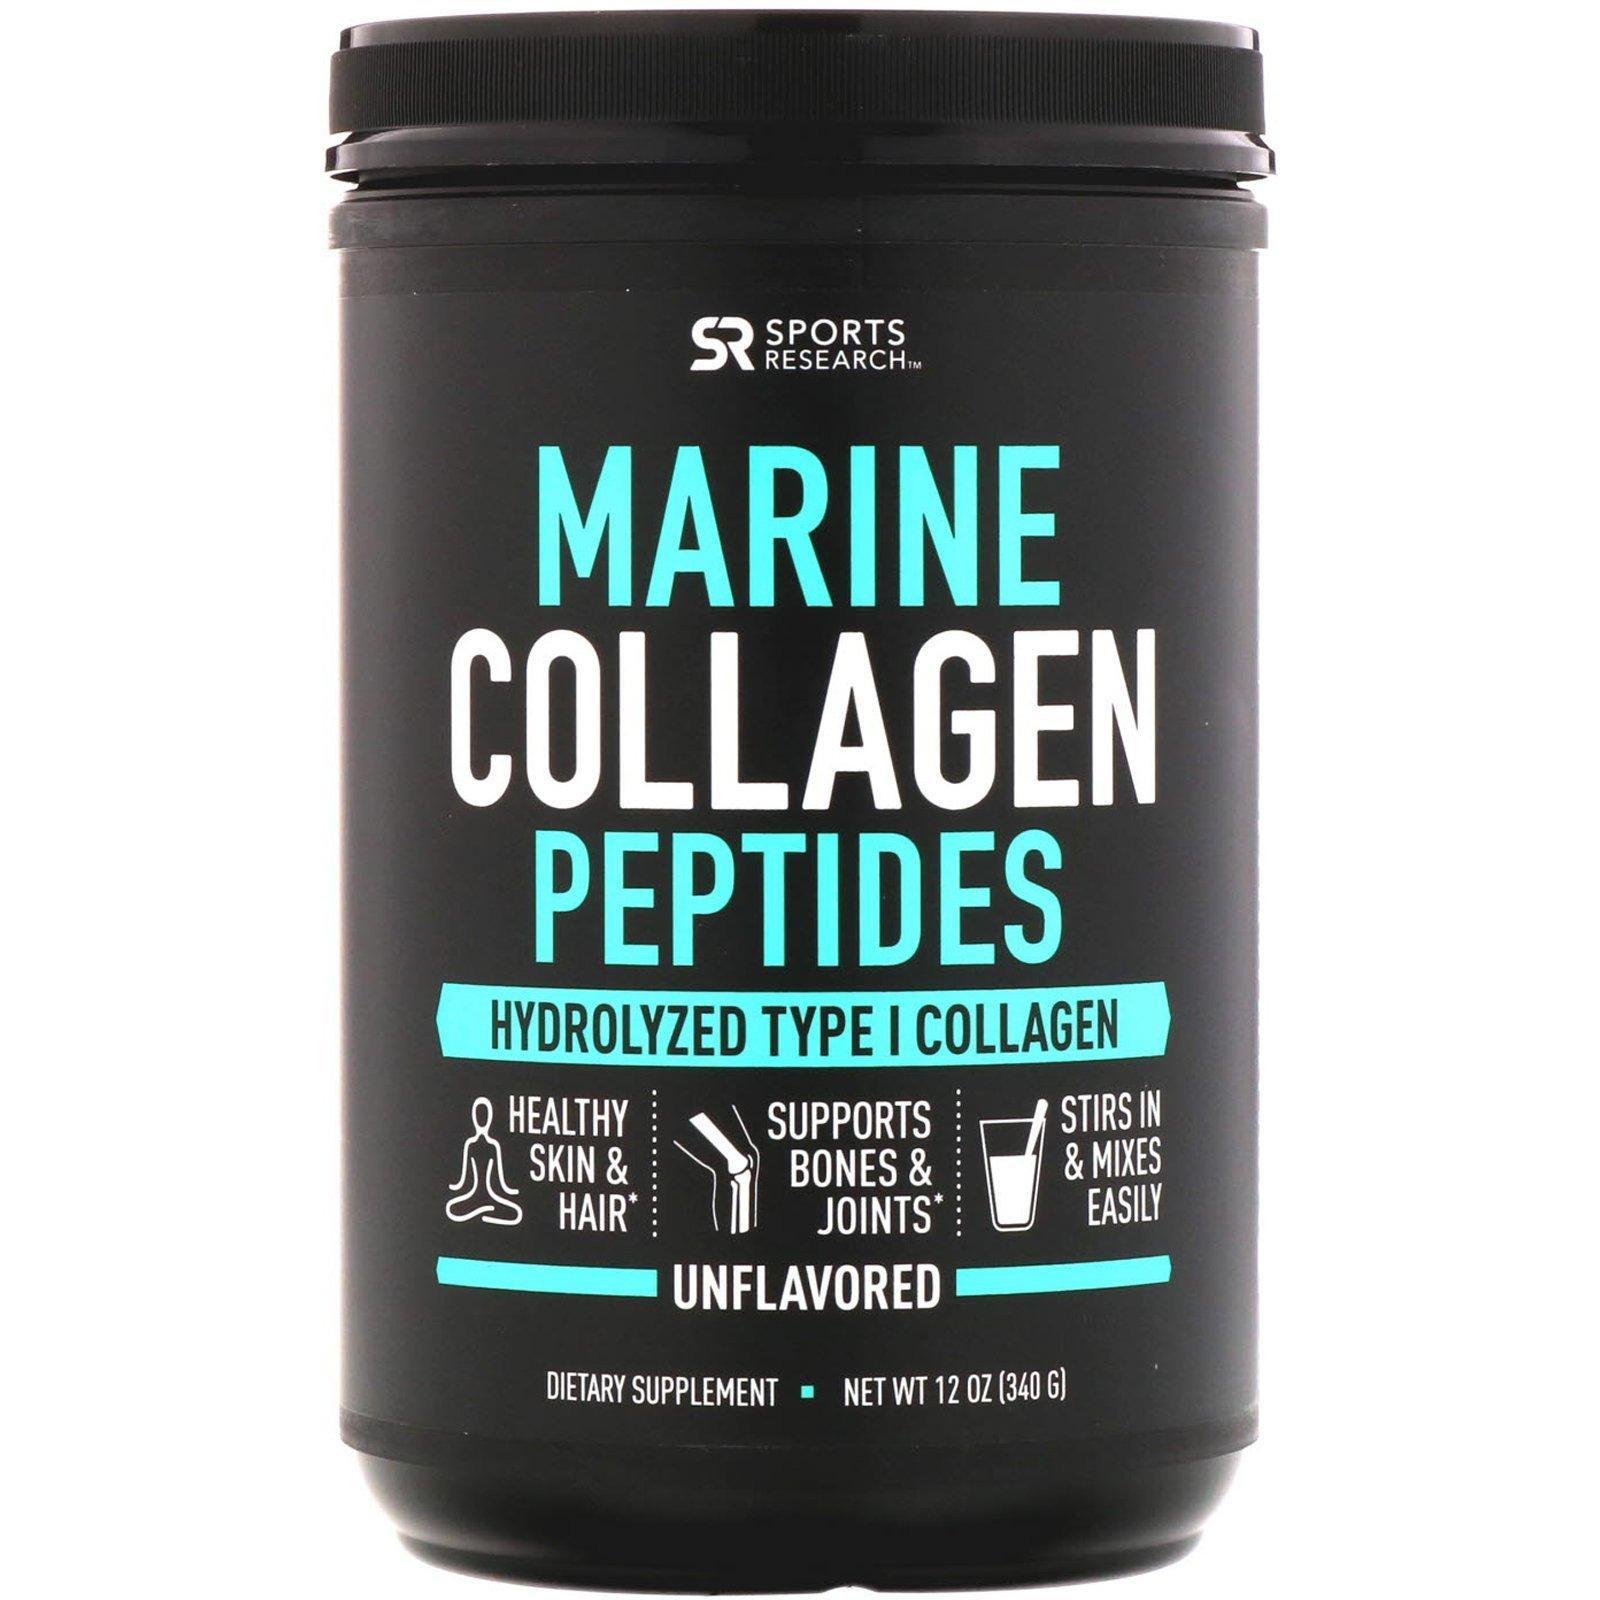 Морской коллаген, Marine Collagen Peptides, Sports Research, 340 г